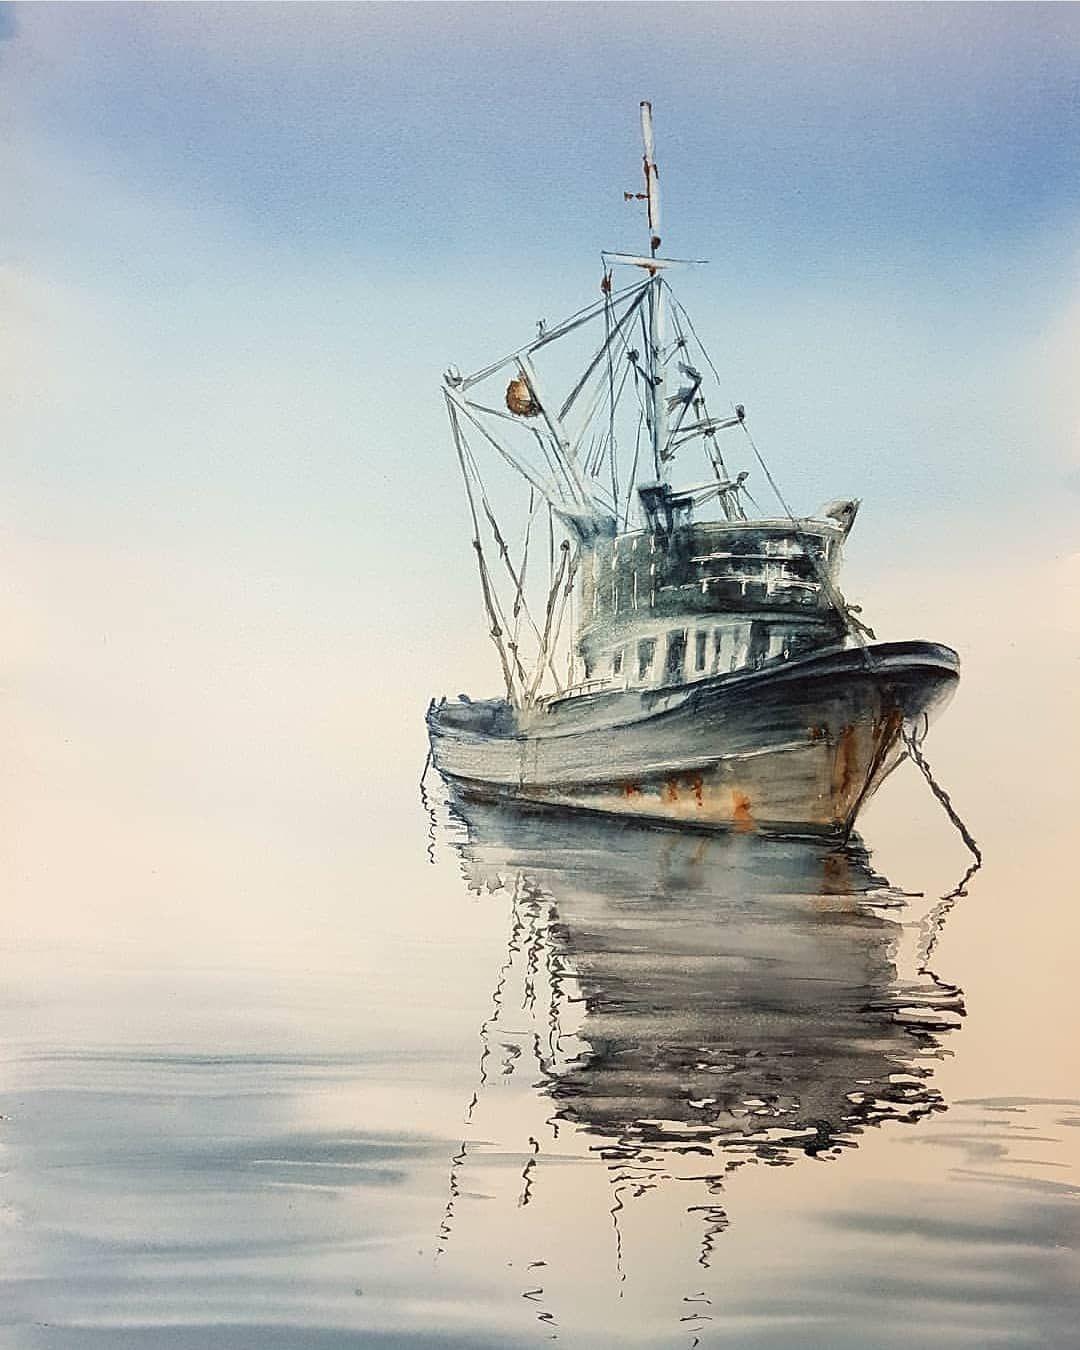 Sport Fishing Grenada Fishing Charters Best Deep Sea Fishing In